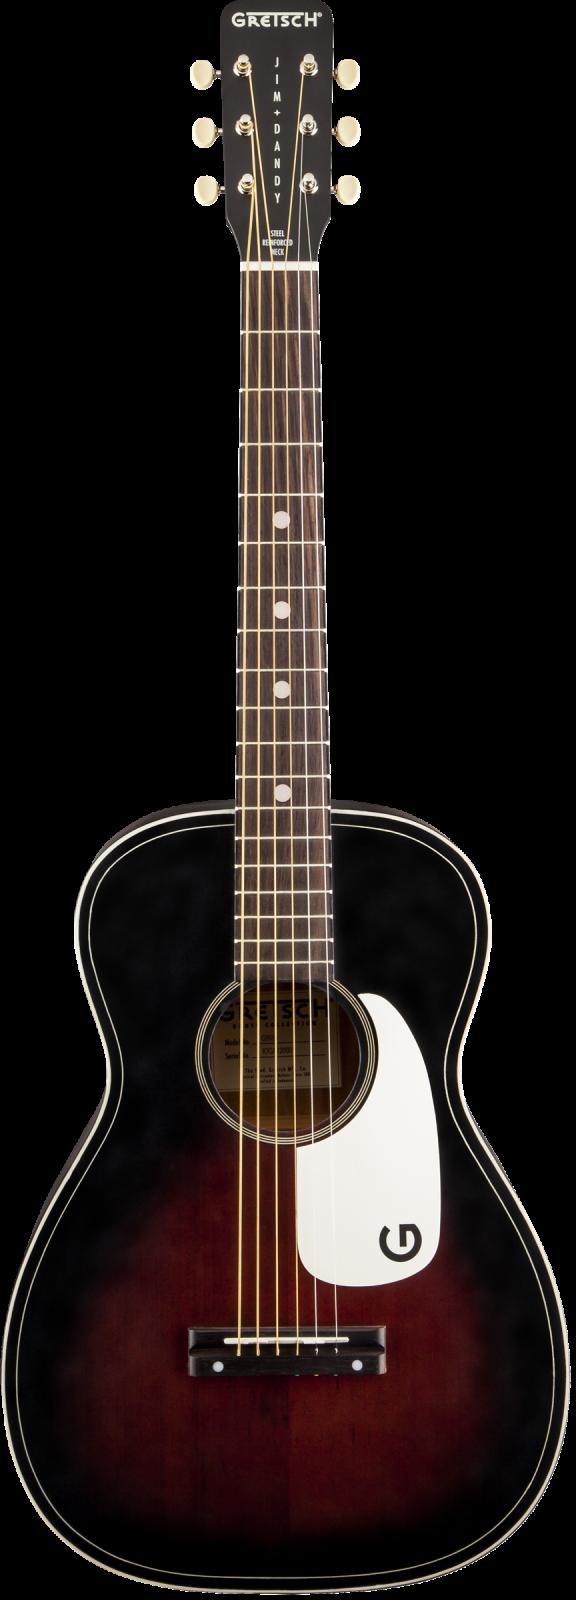 Gretsch G9500 Jim Dandy 24 Inch Flat Top Acoustic Guitar